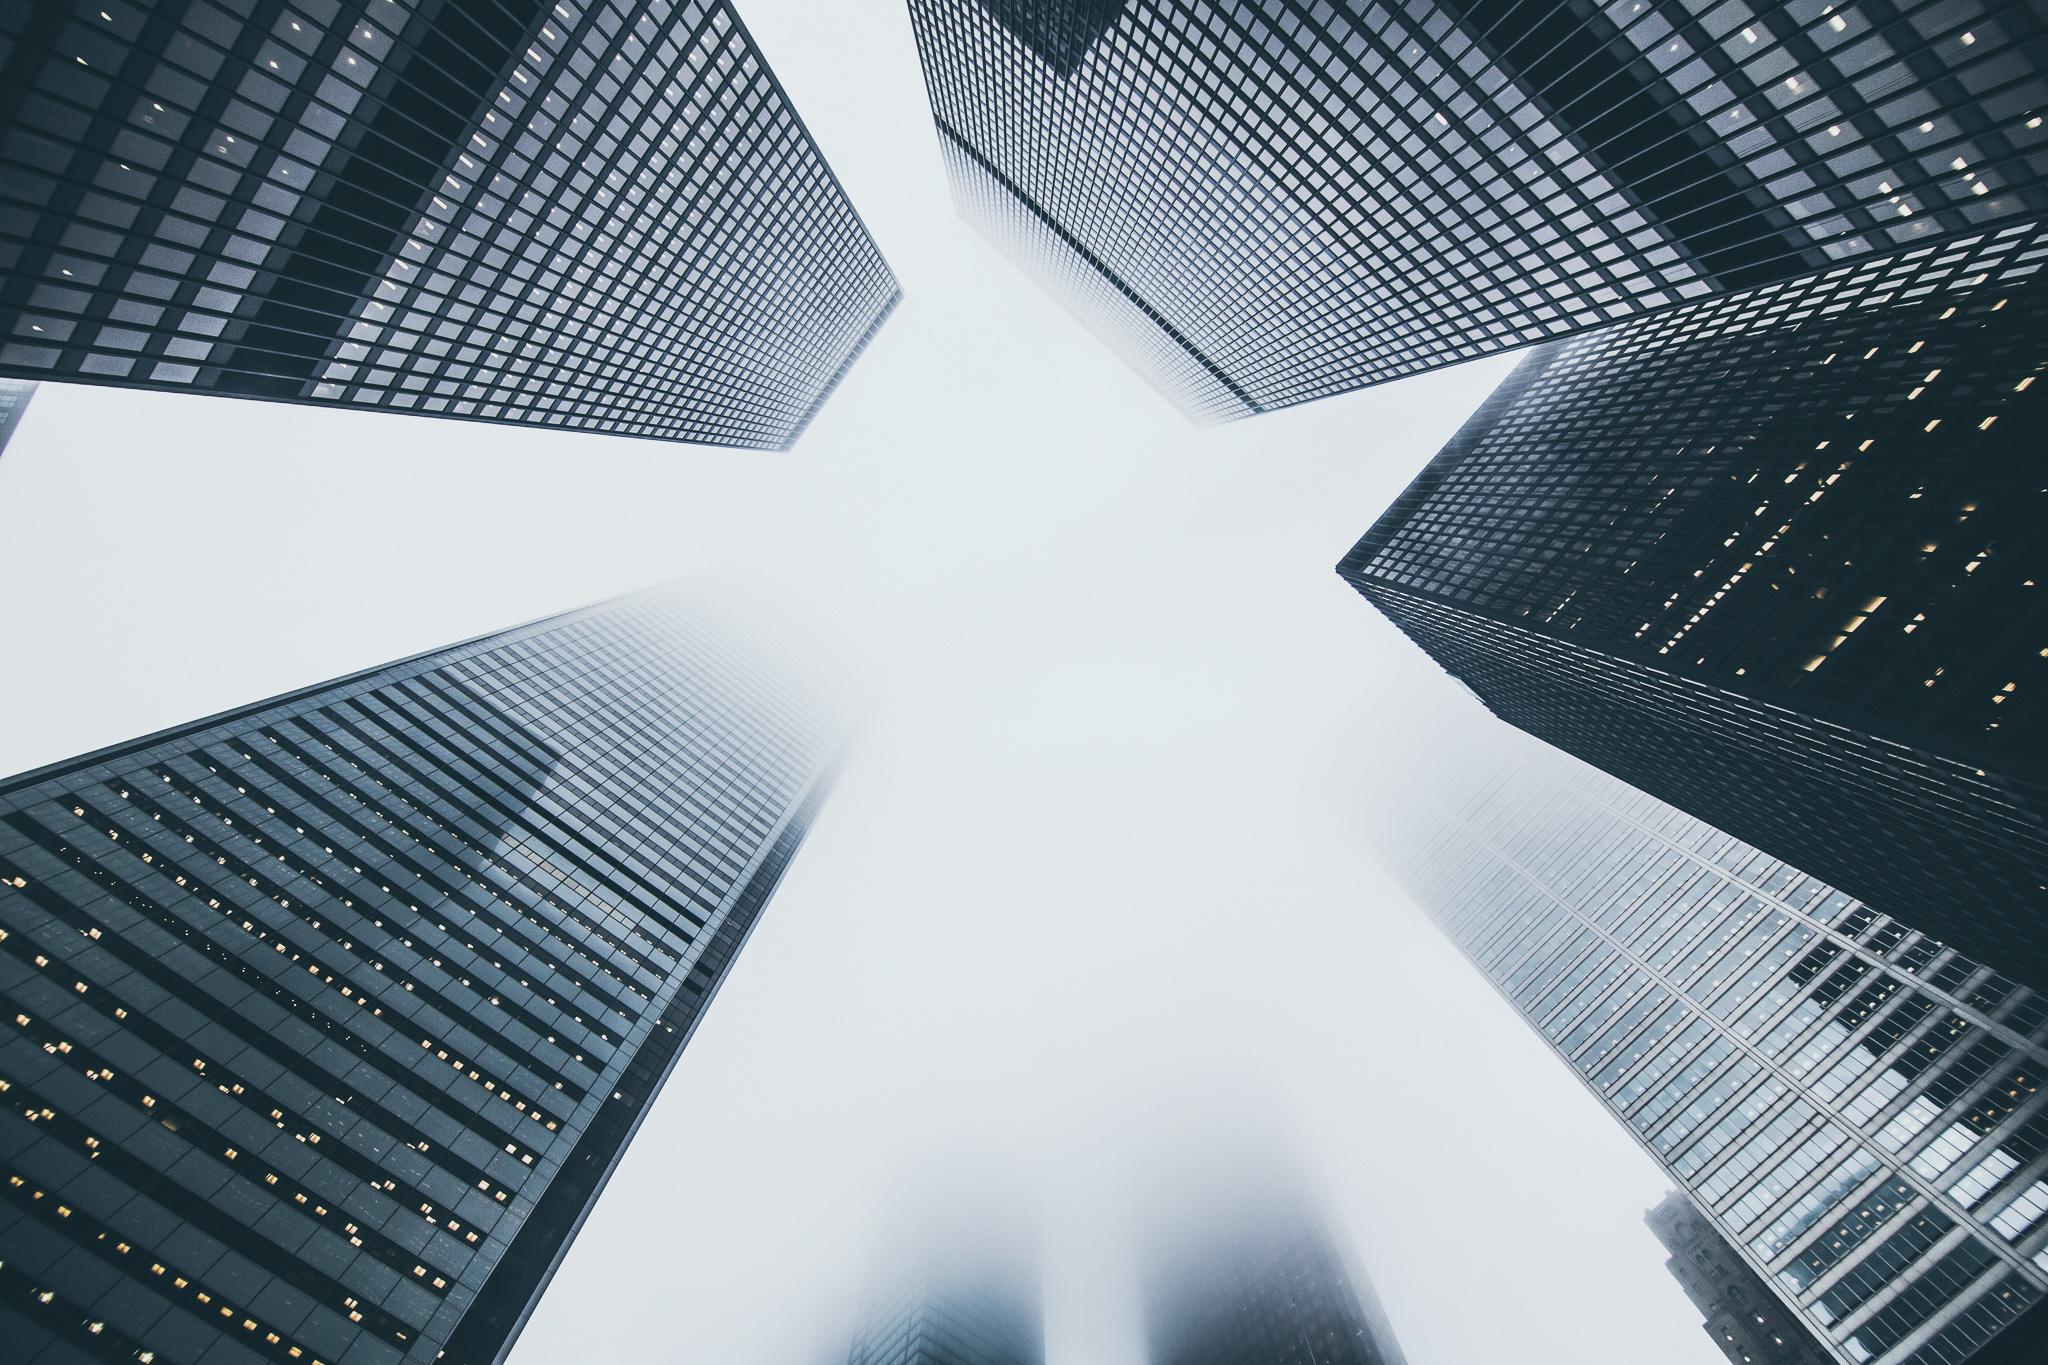 skyscrapers-1081737.jpg